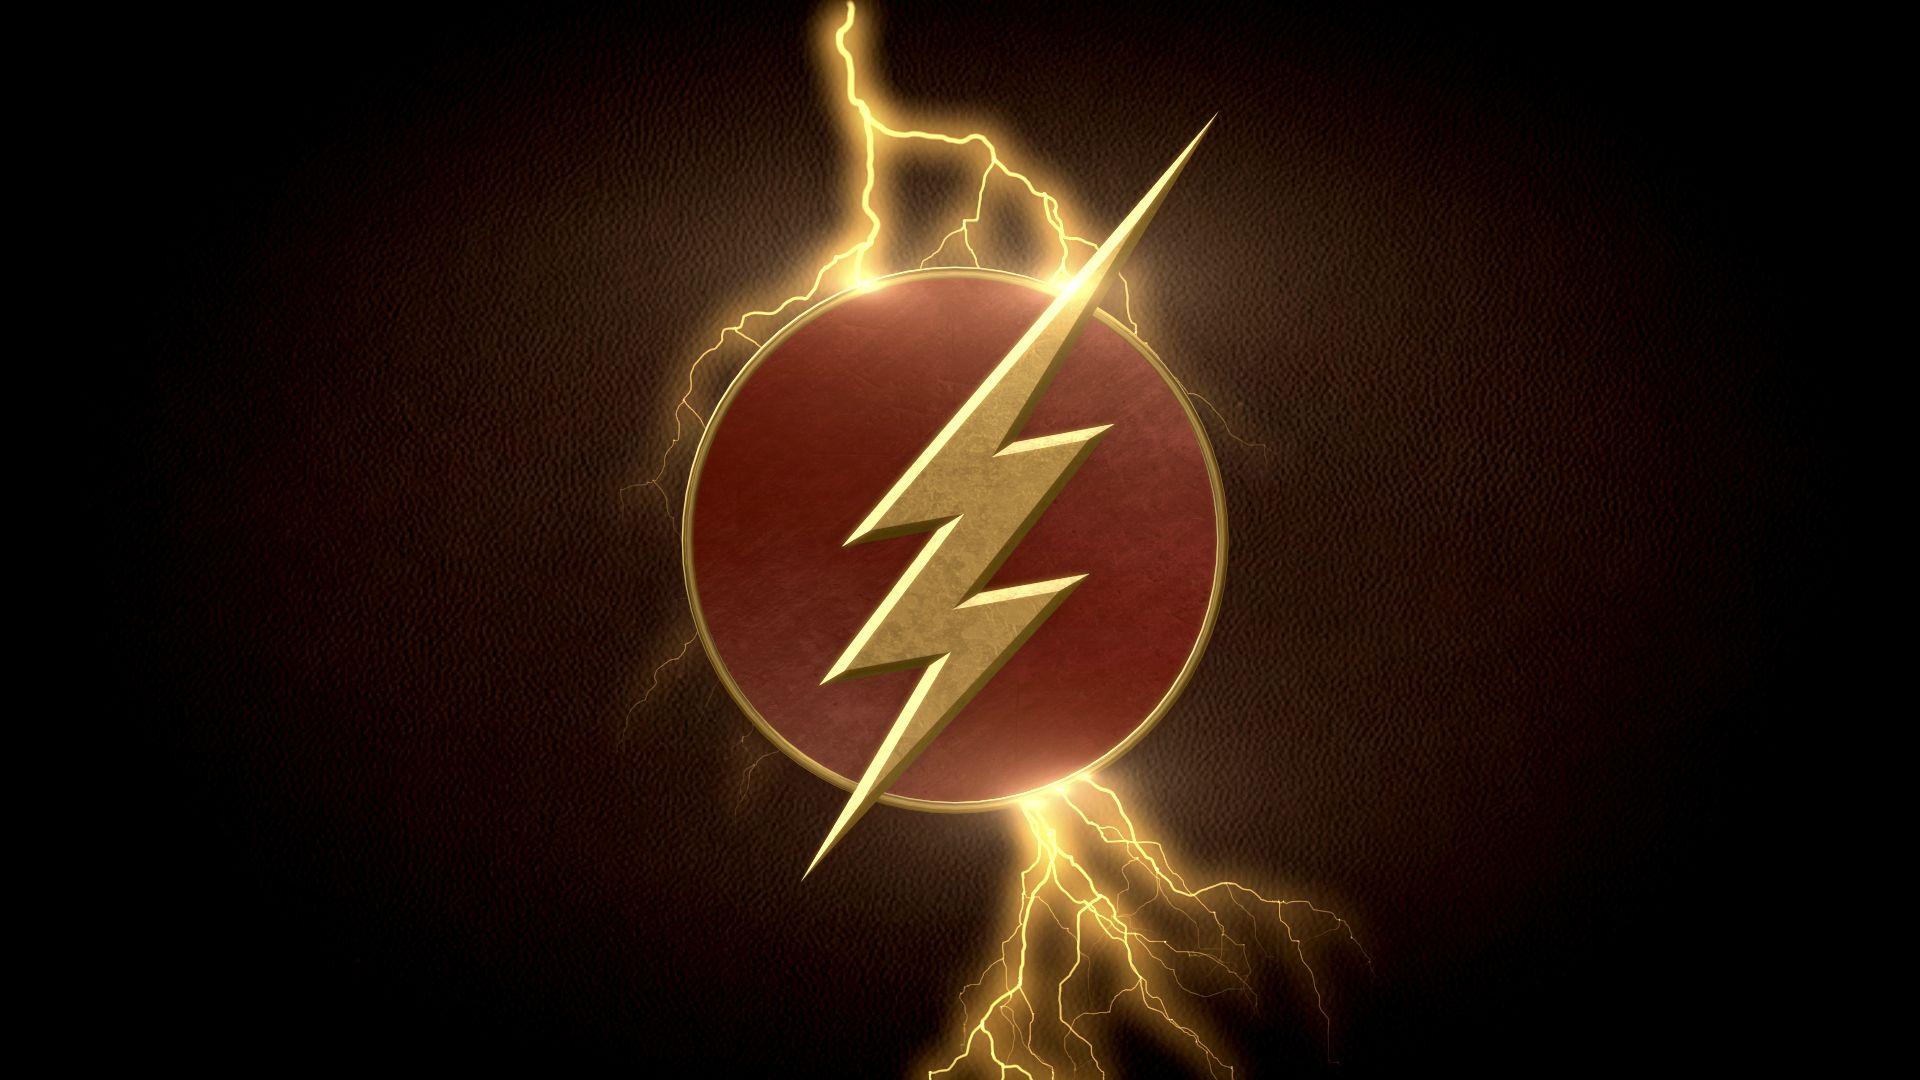 User BigRockDJ posted an awesome Flash logo wallpaper to rDCcomics 1920x1080